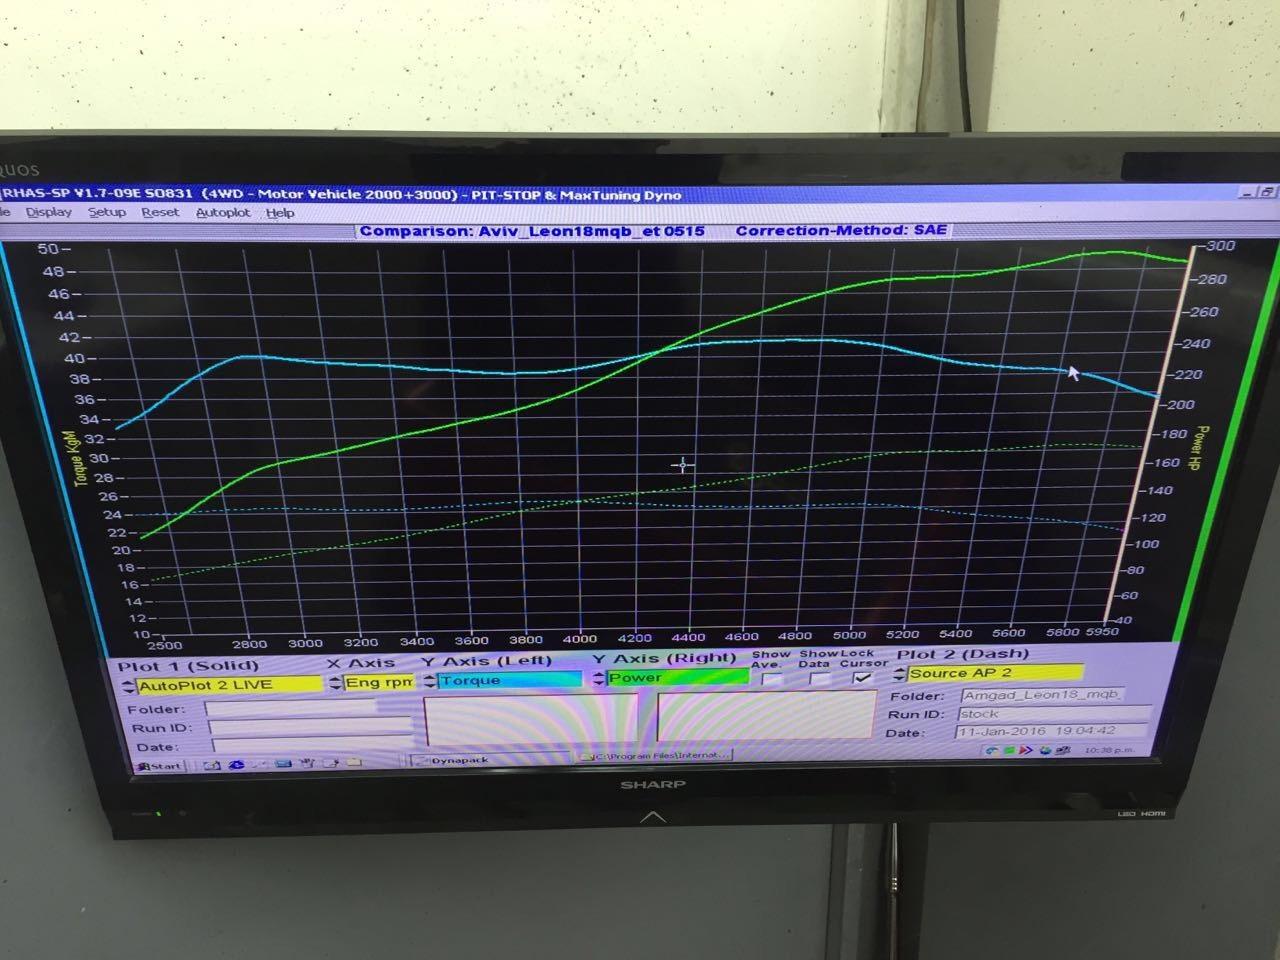 1 8TSI Gen3 Etuners Stage3 IS20 Turbo 300hp 400nm — Etuners